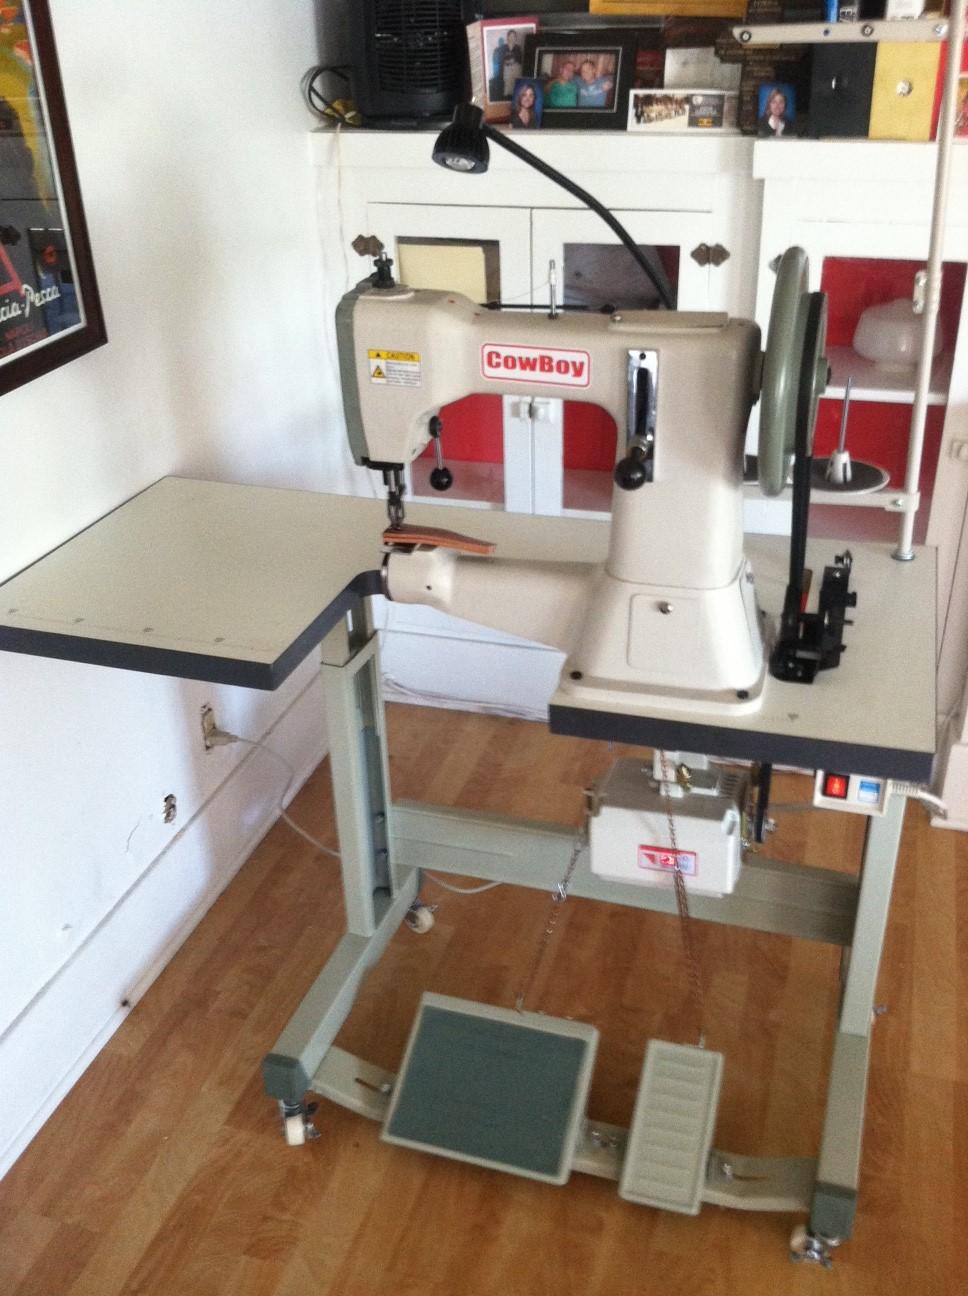 cowboy 3200 sewing machine